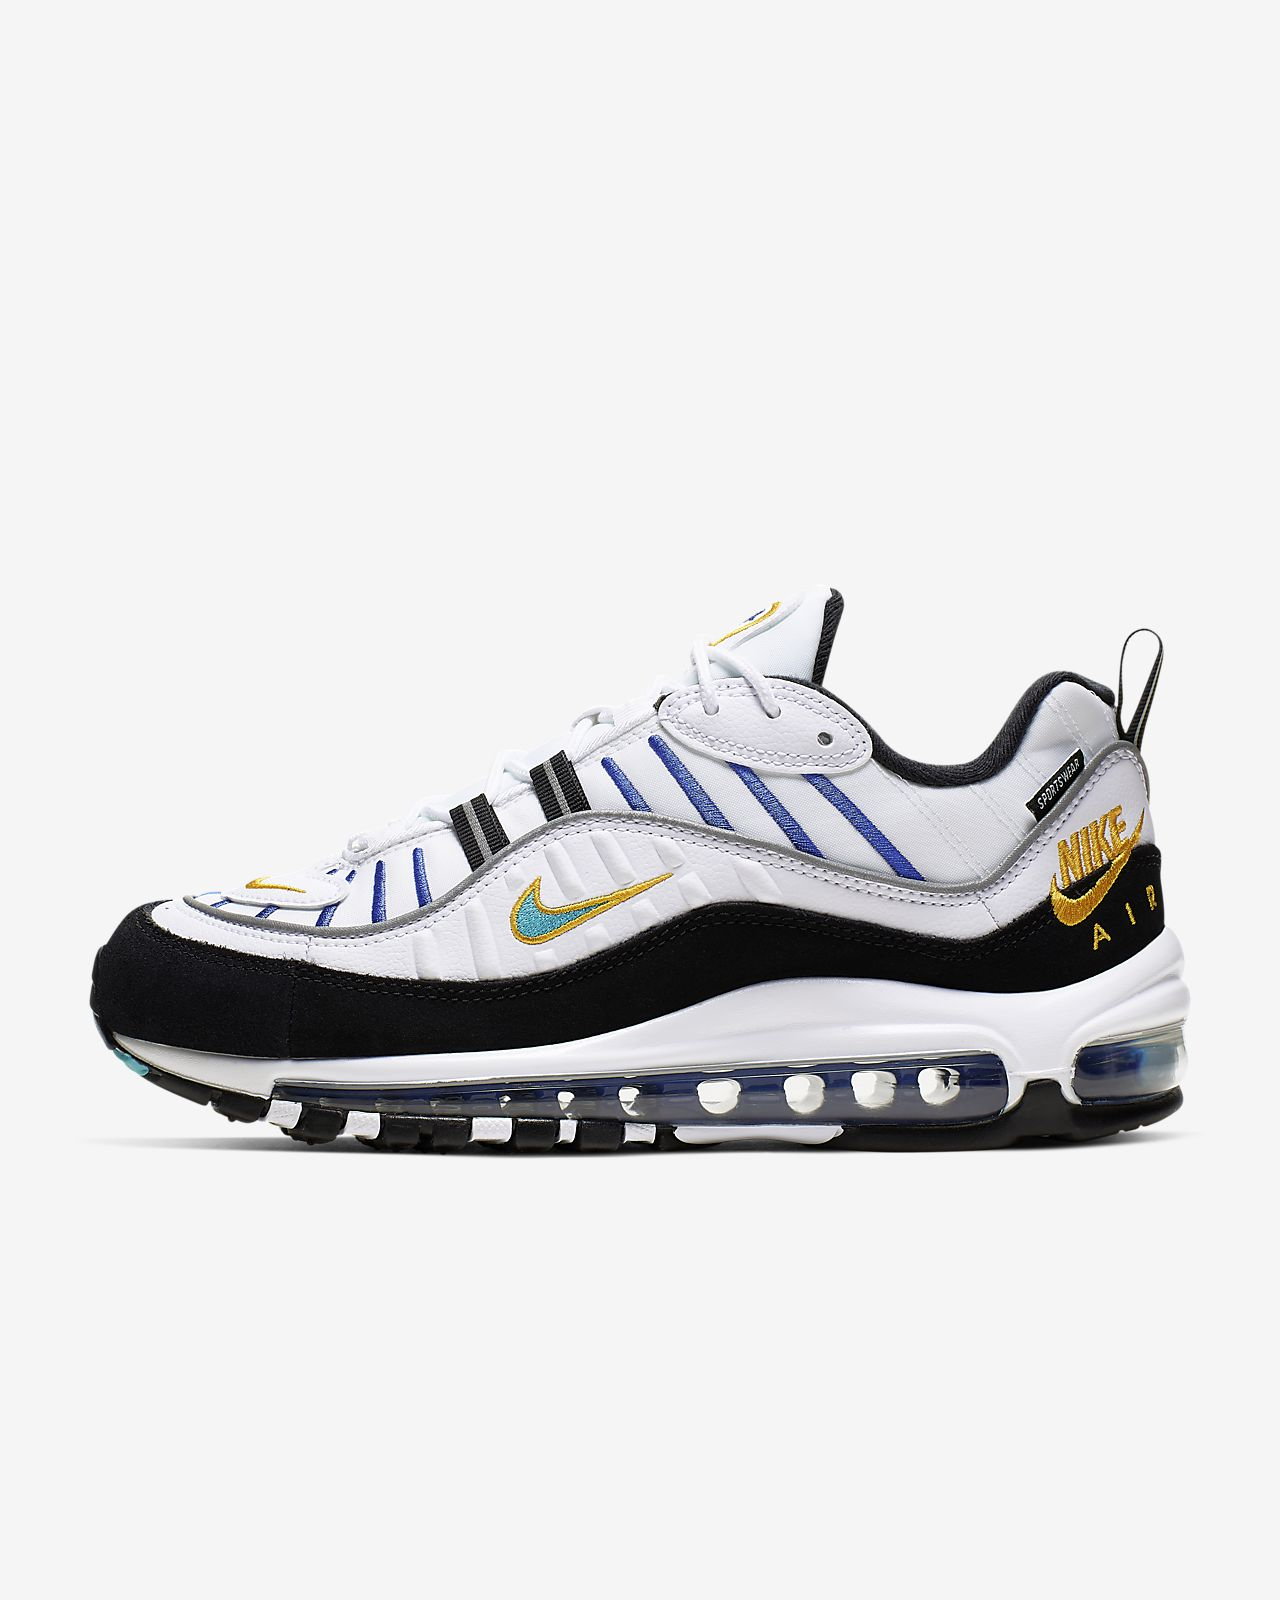 Nike Air Max 98 Premium Damesschoen